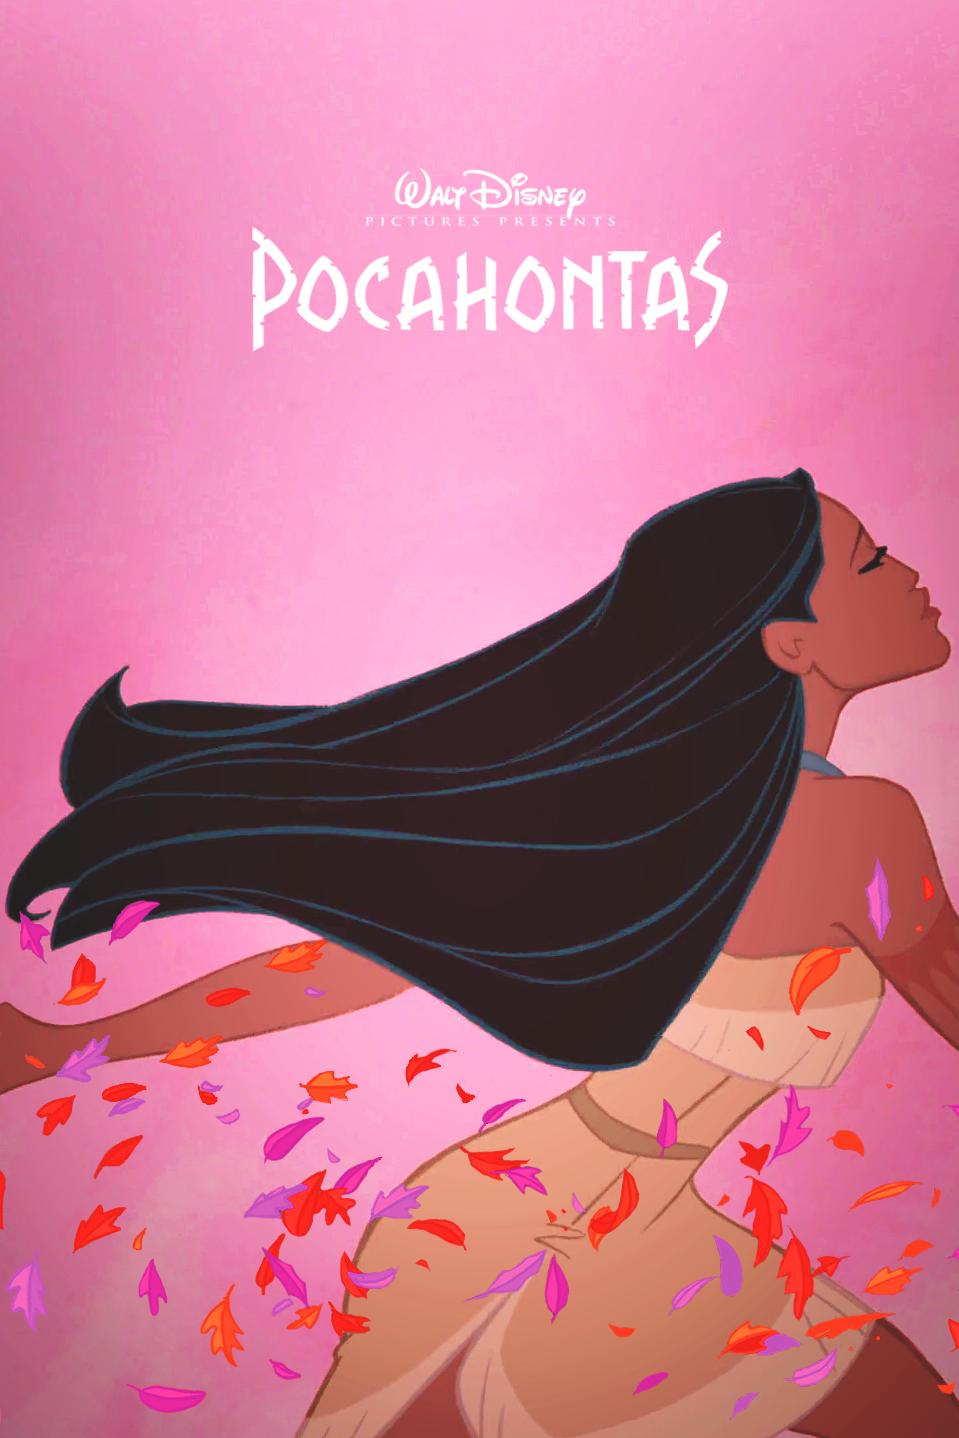 Pocahontas Fanmade poster